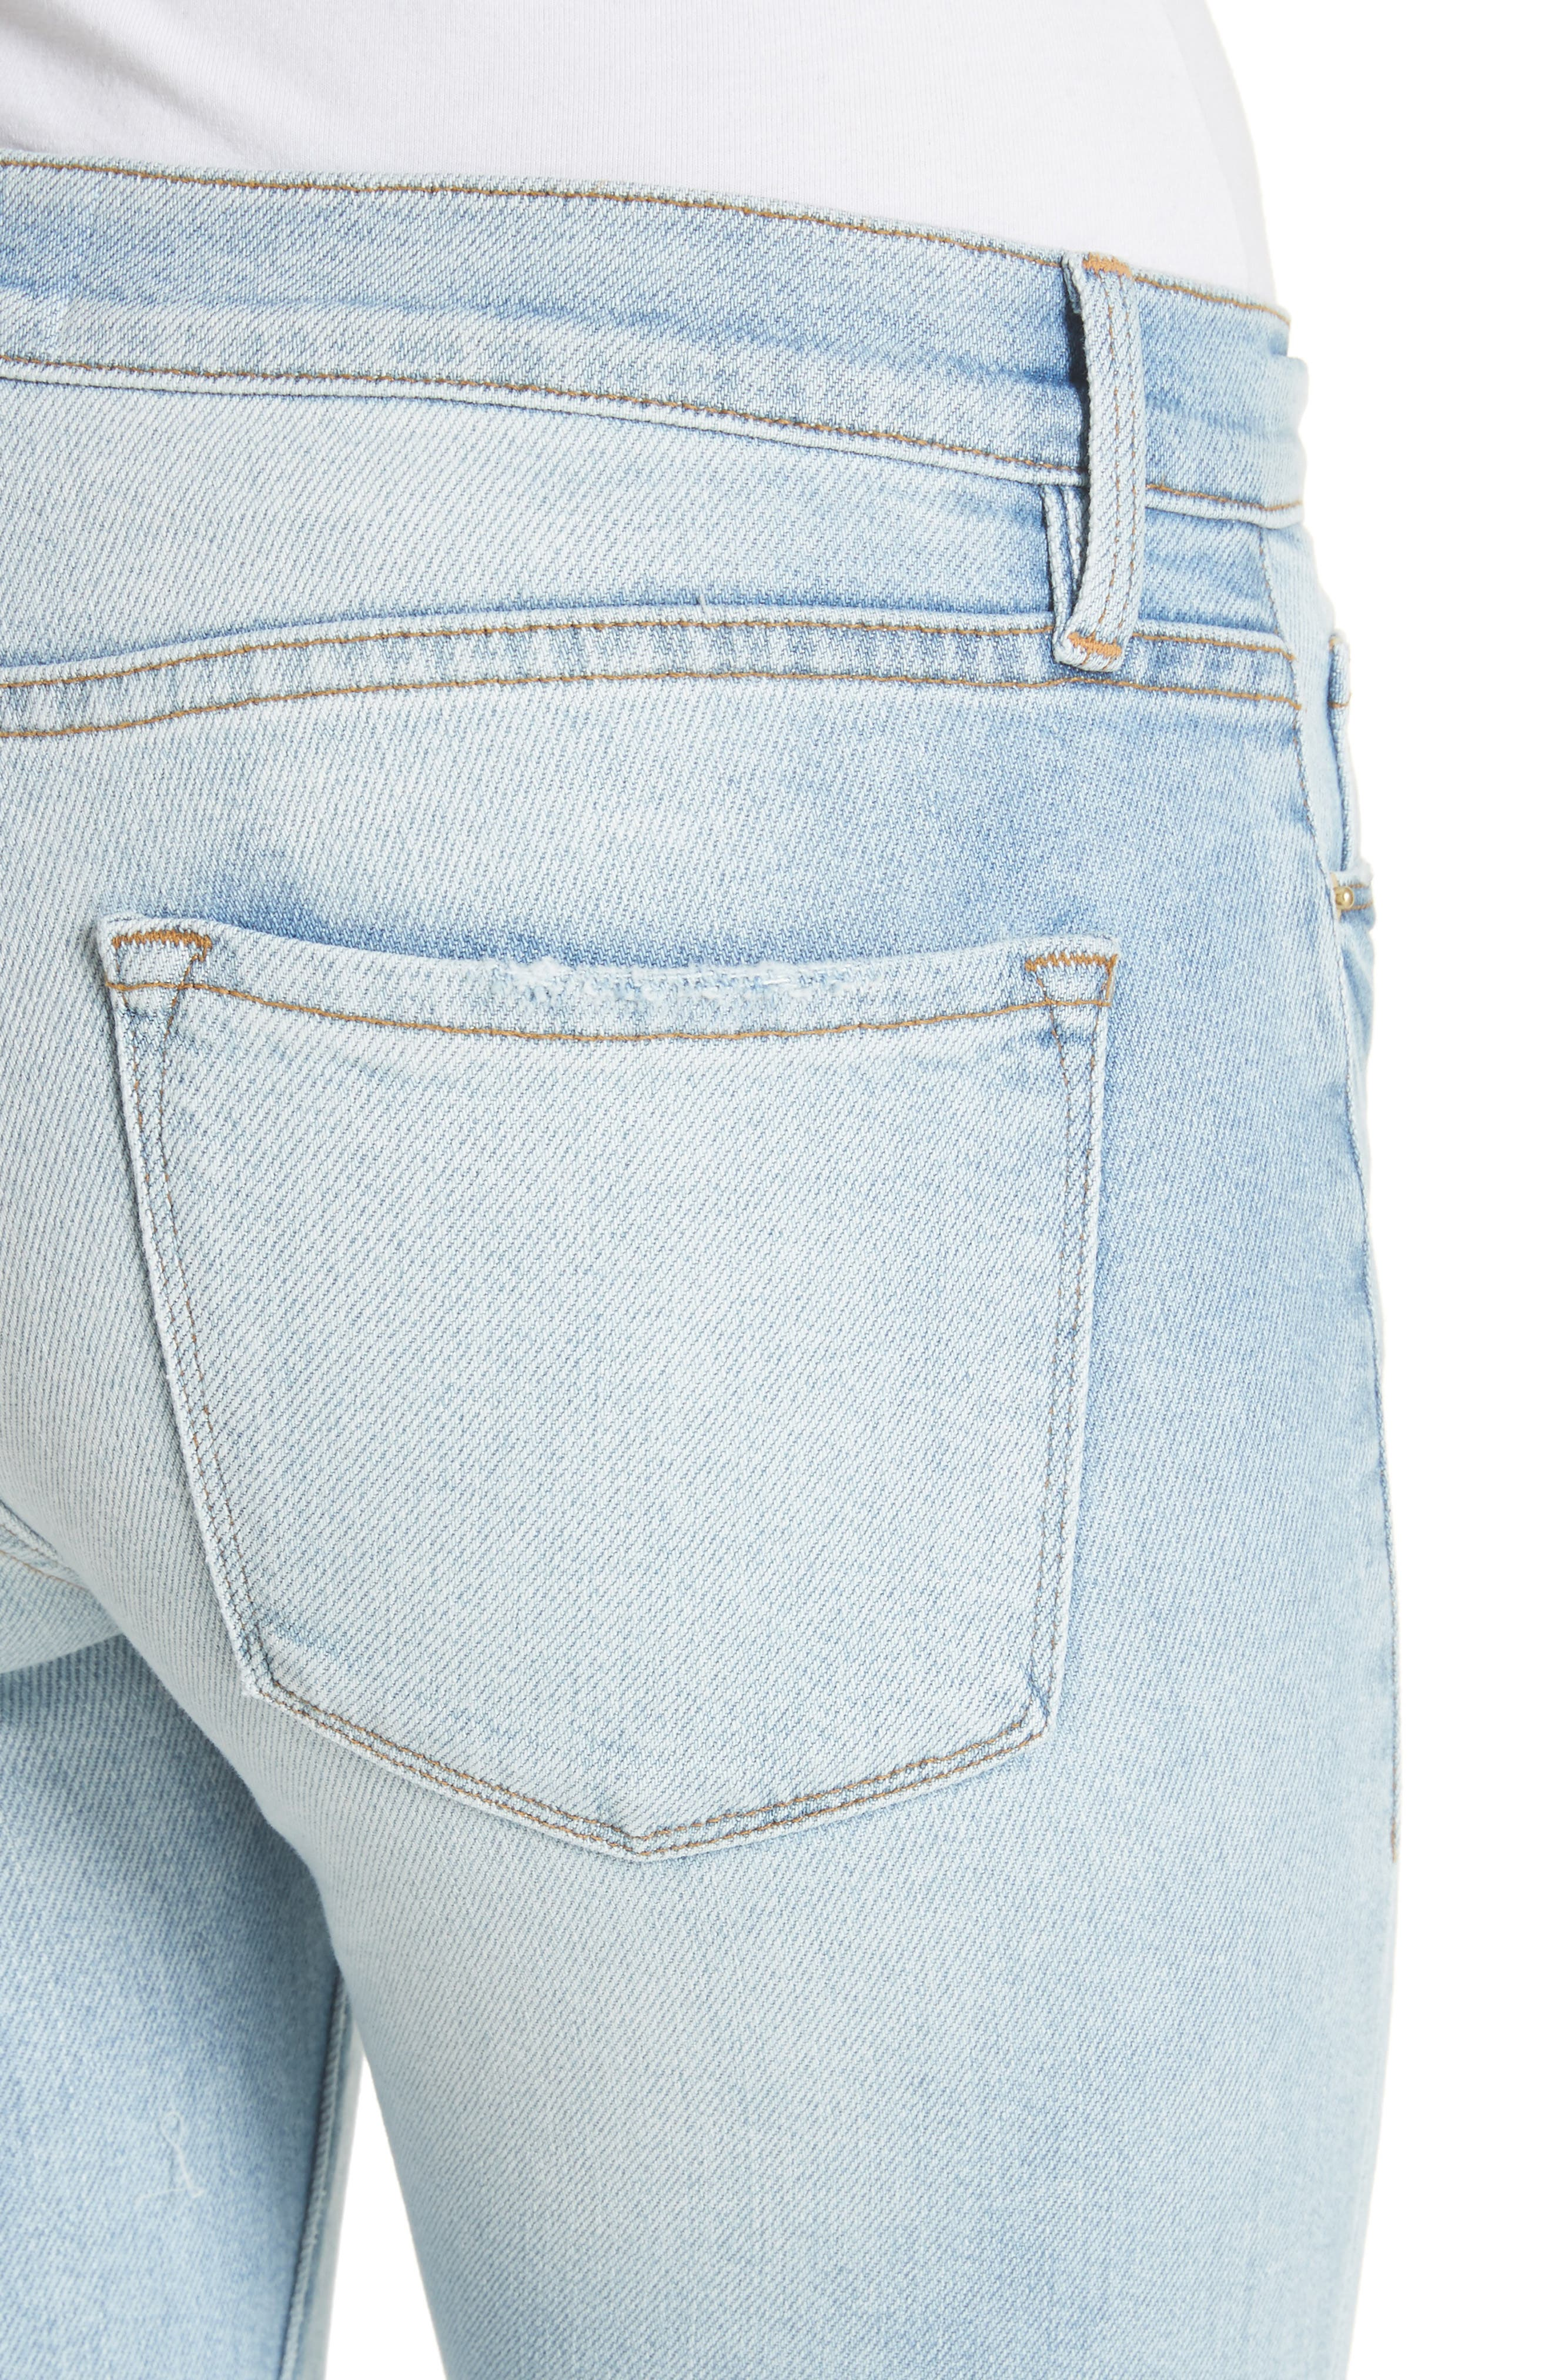 Le Skinny de Jeanne Ankle Jeans,                             Alternate thumbnail 4, color,                             Adeline